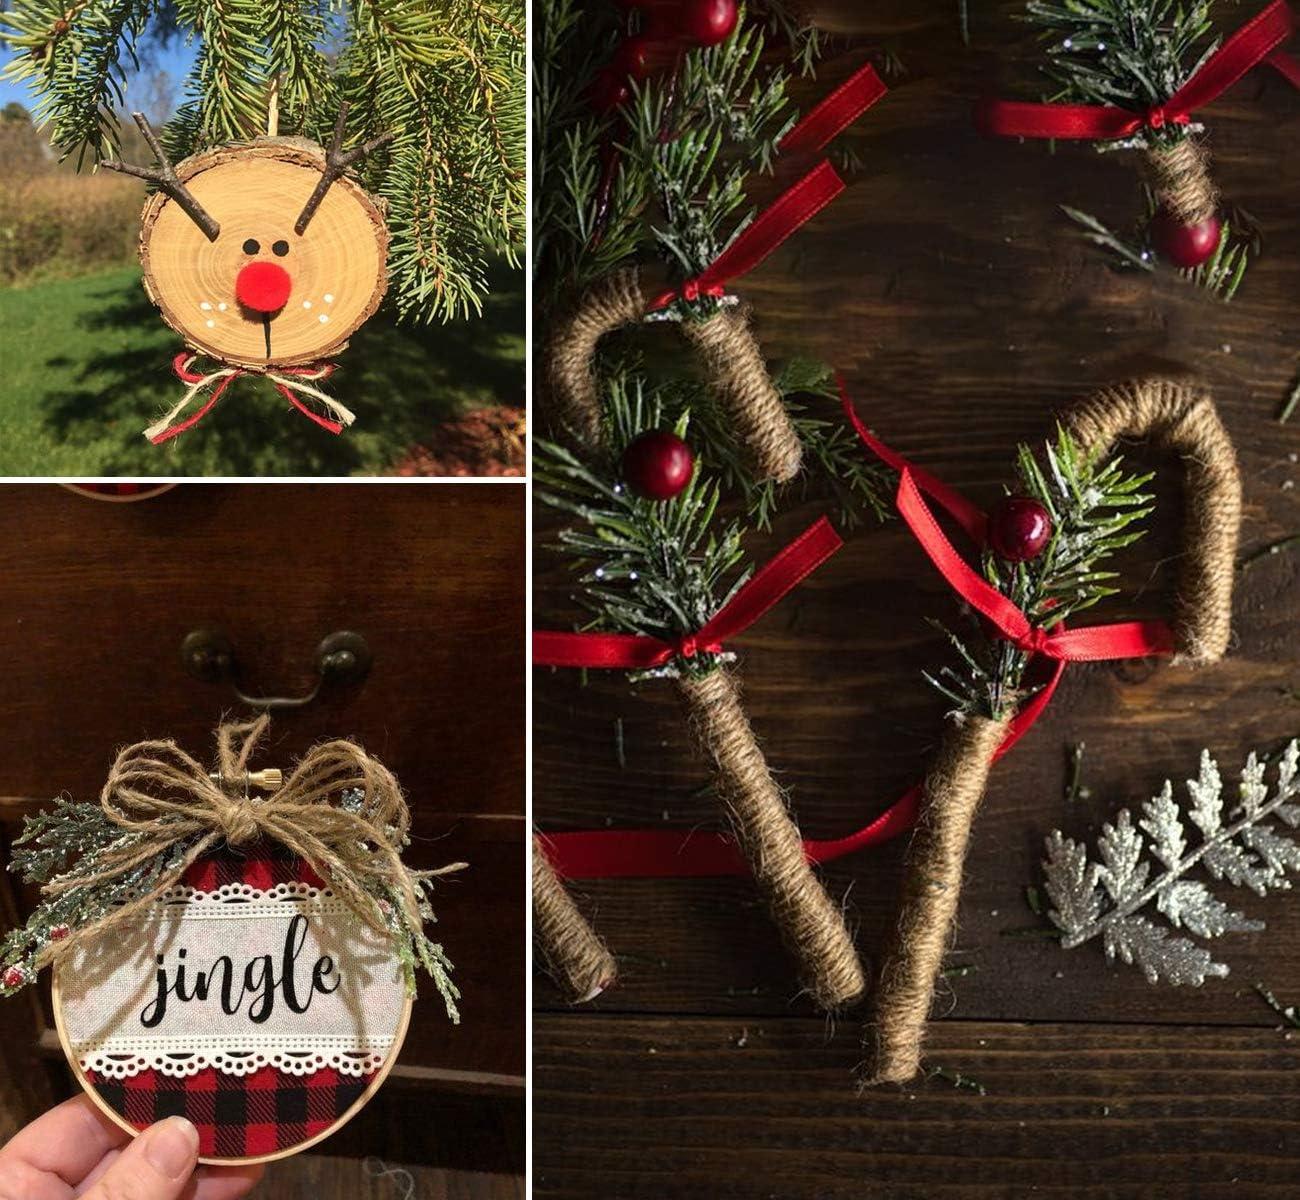 2mm 3 Ply Art Craft Garden Twine Jute Rope for Floristry Lemonfilter 1300 Feet Natural Jute Twine Gardening Bundling and Wedding Decorating Christmas Jute String DIY Gift Packing